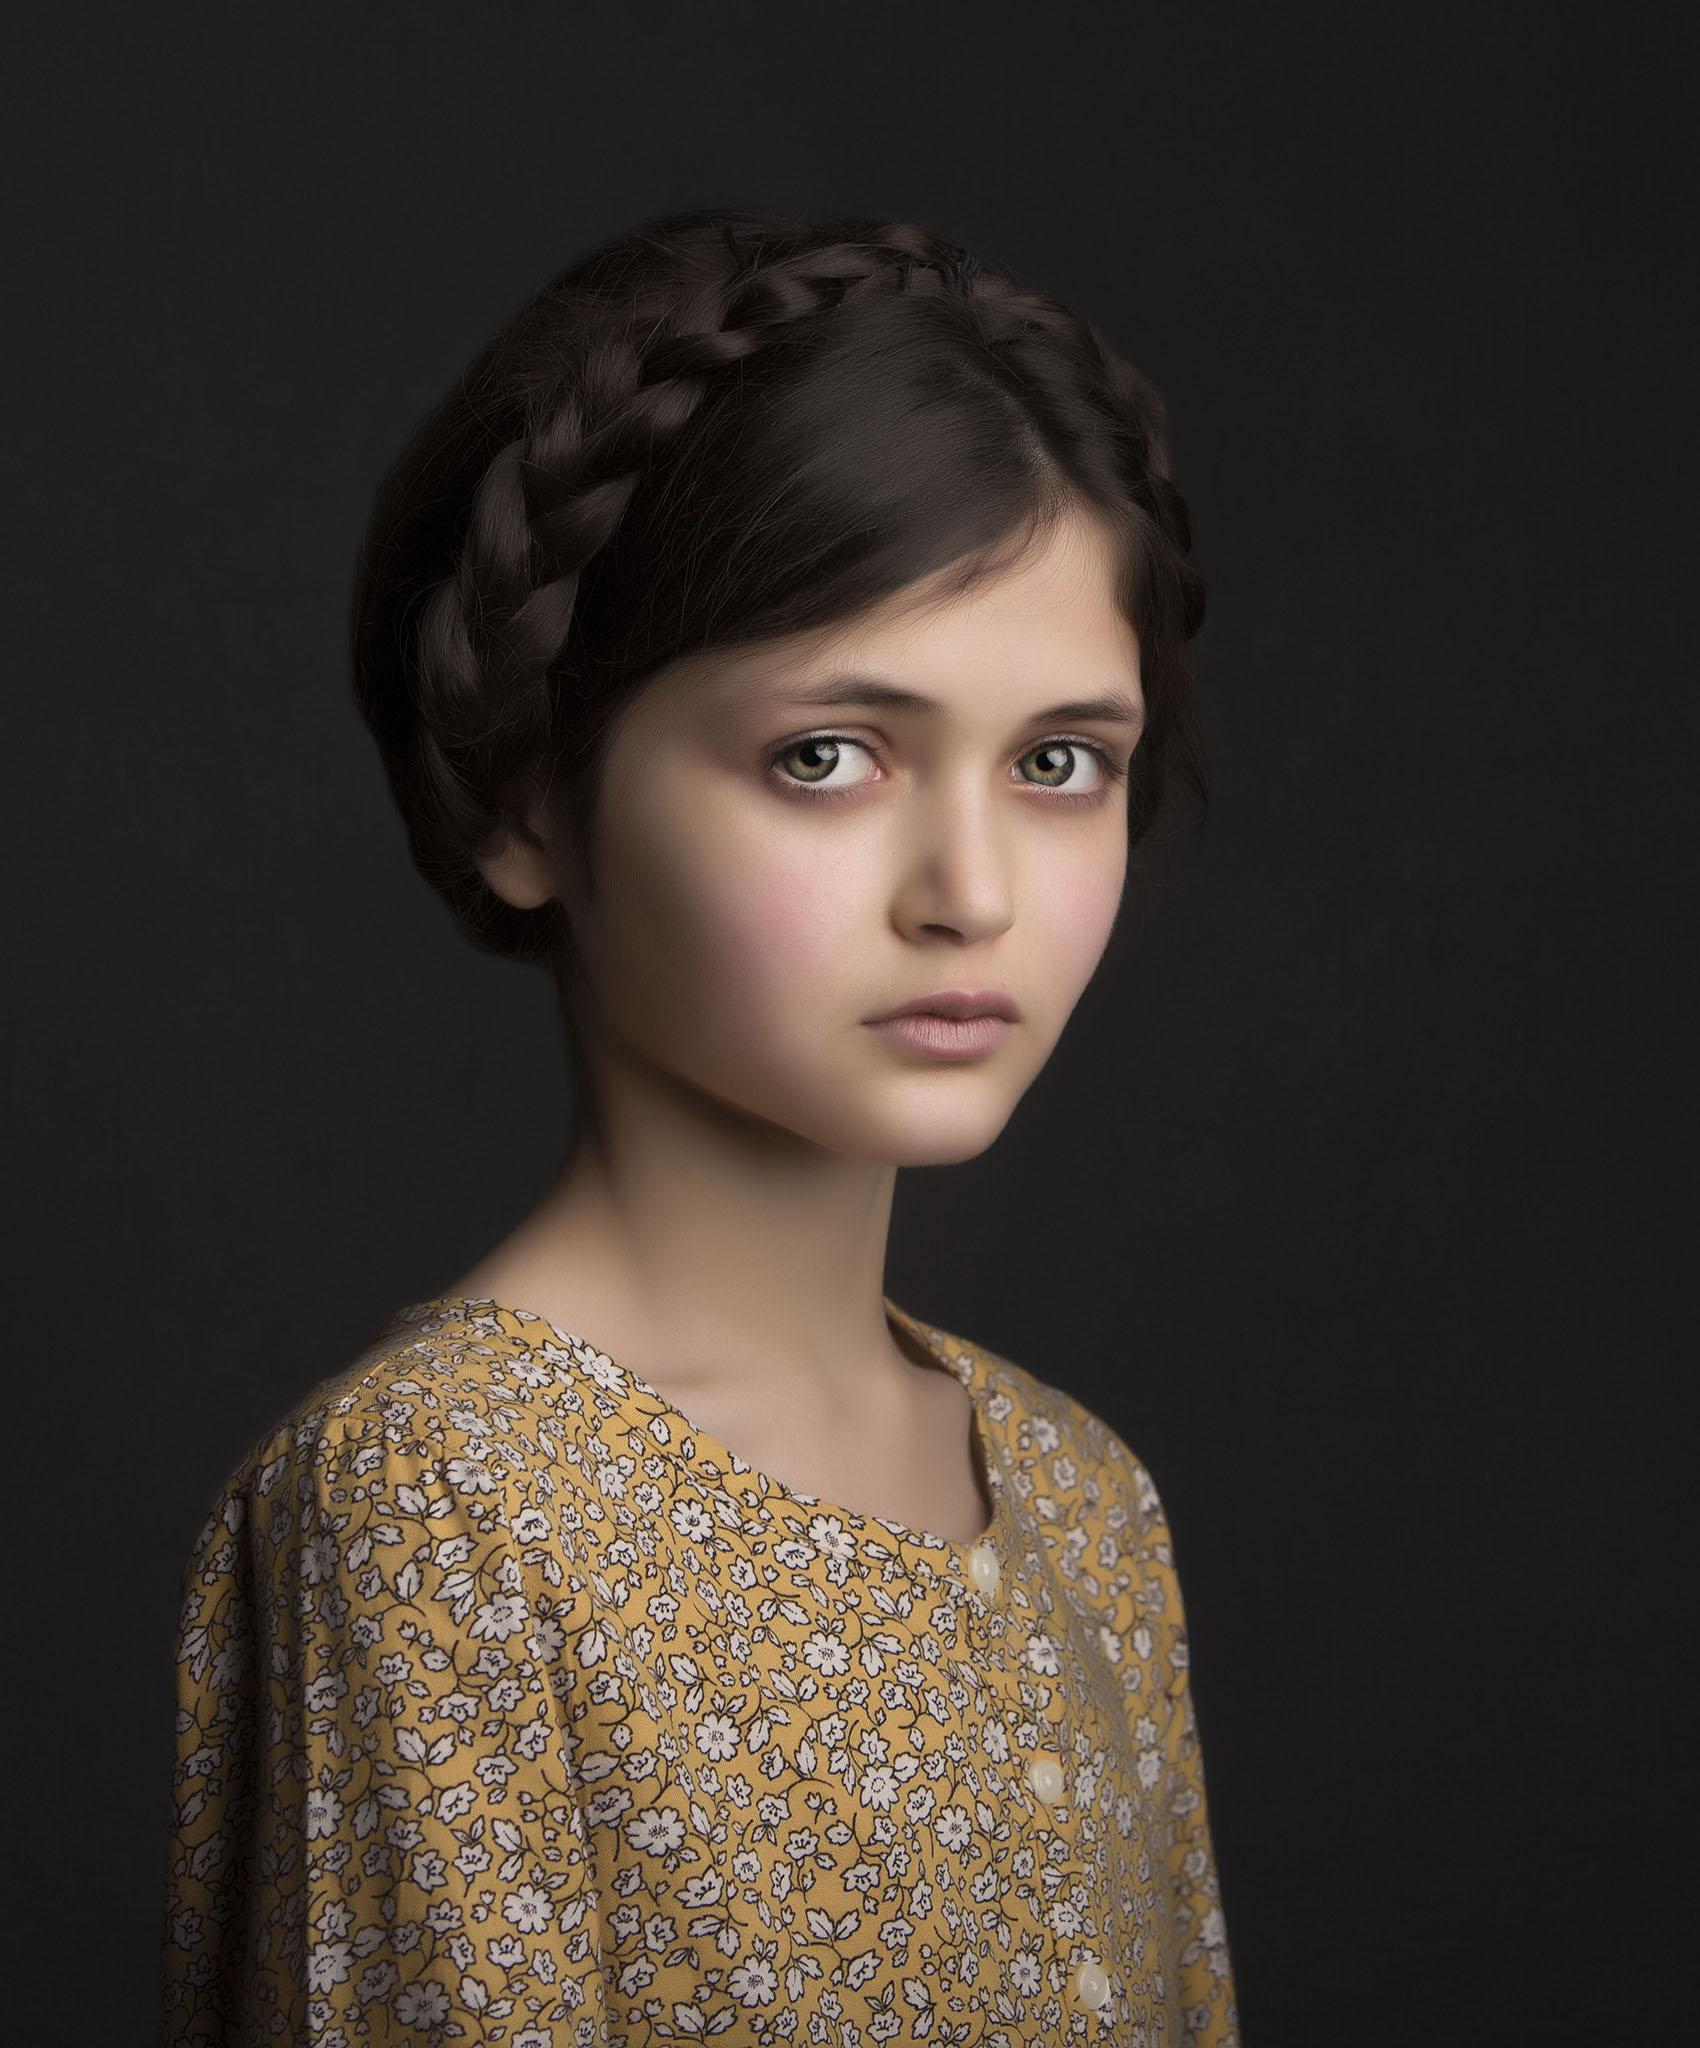 elizabethgphotography_kingslangley_hertfordshire_fineart_childrens_photography_03.jpg